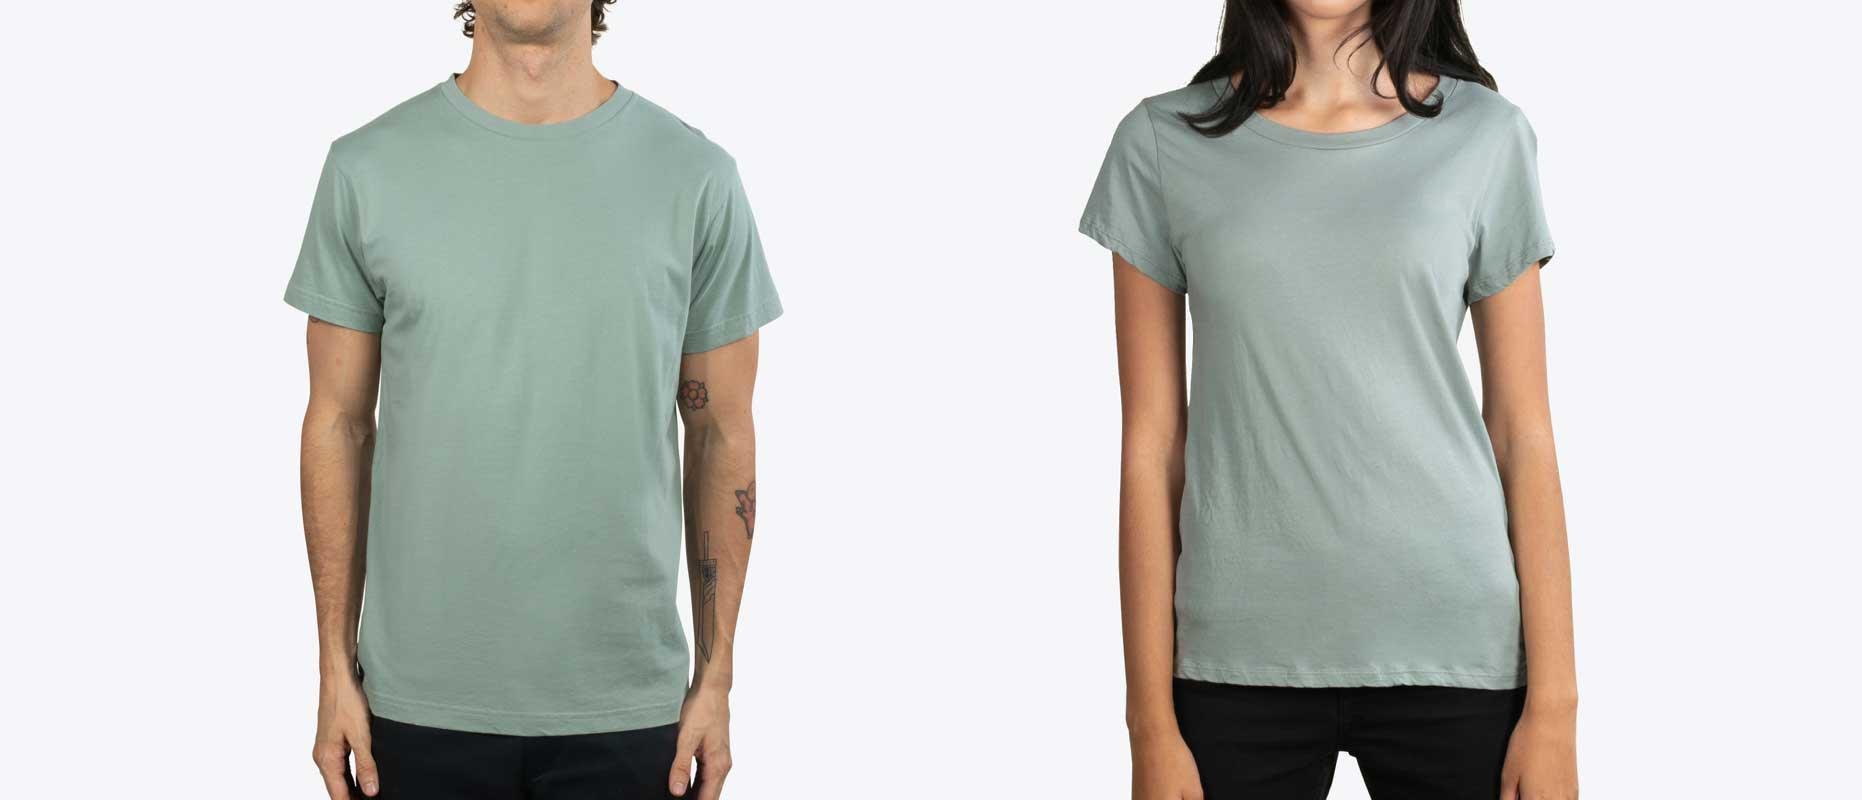 man and woman modeling green shirt